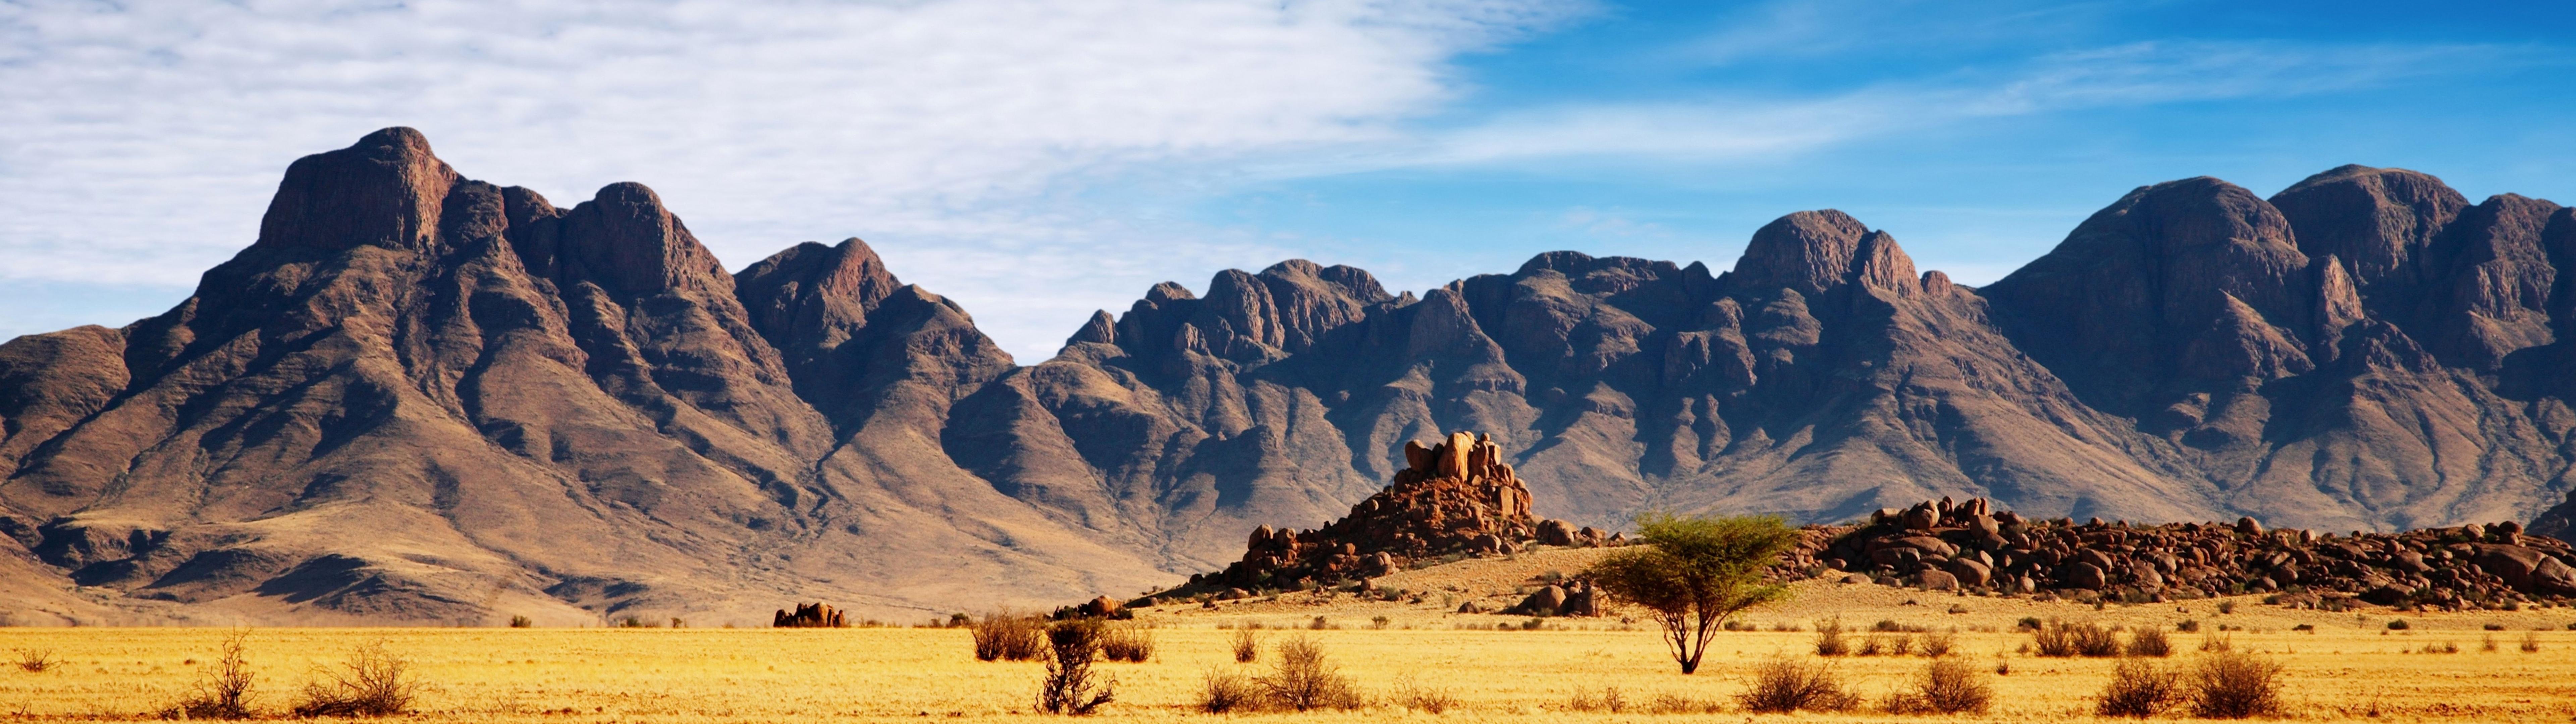 Desert Mountains Desktop Background Wallpaper Download 7680x2160